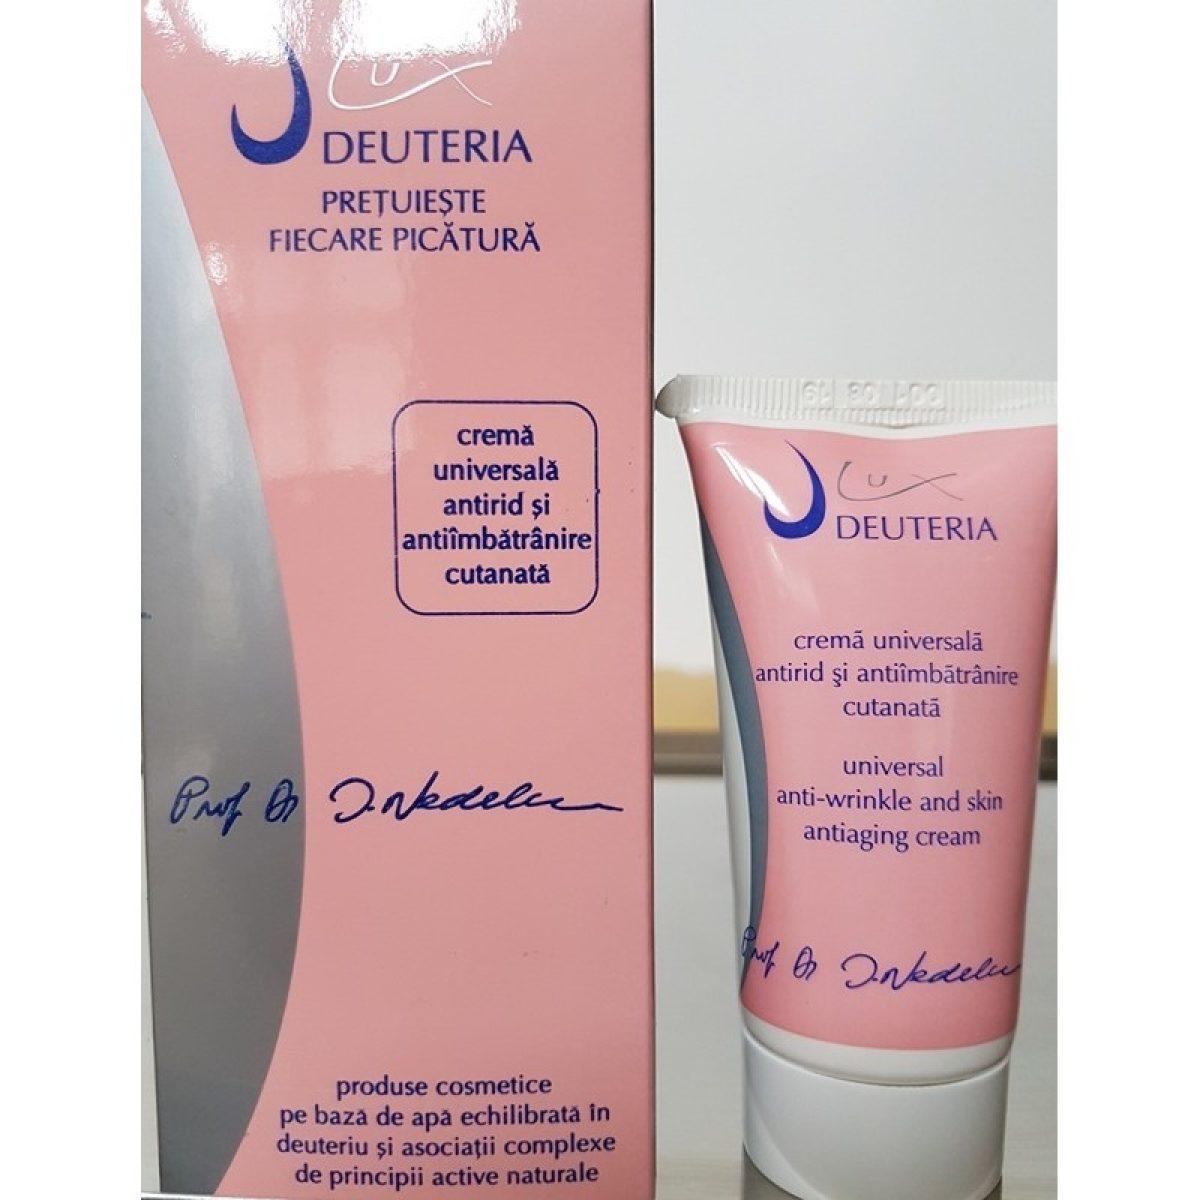 Crema universala antirid si anti imbatranire cutanata